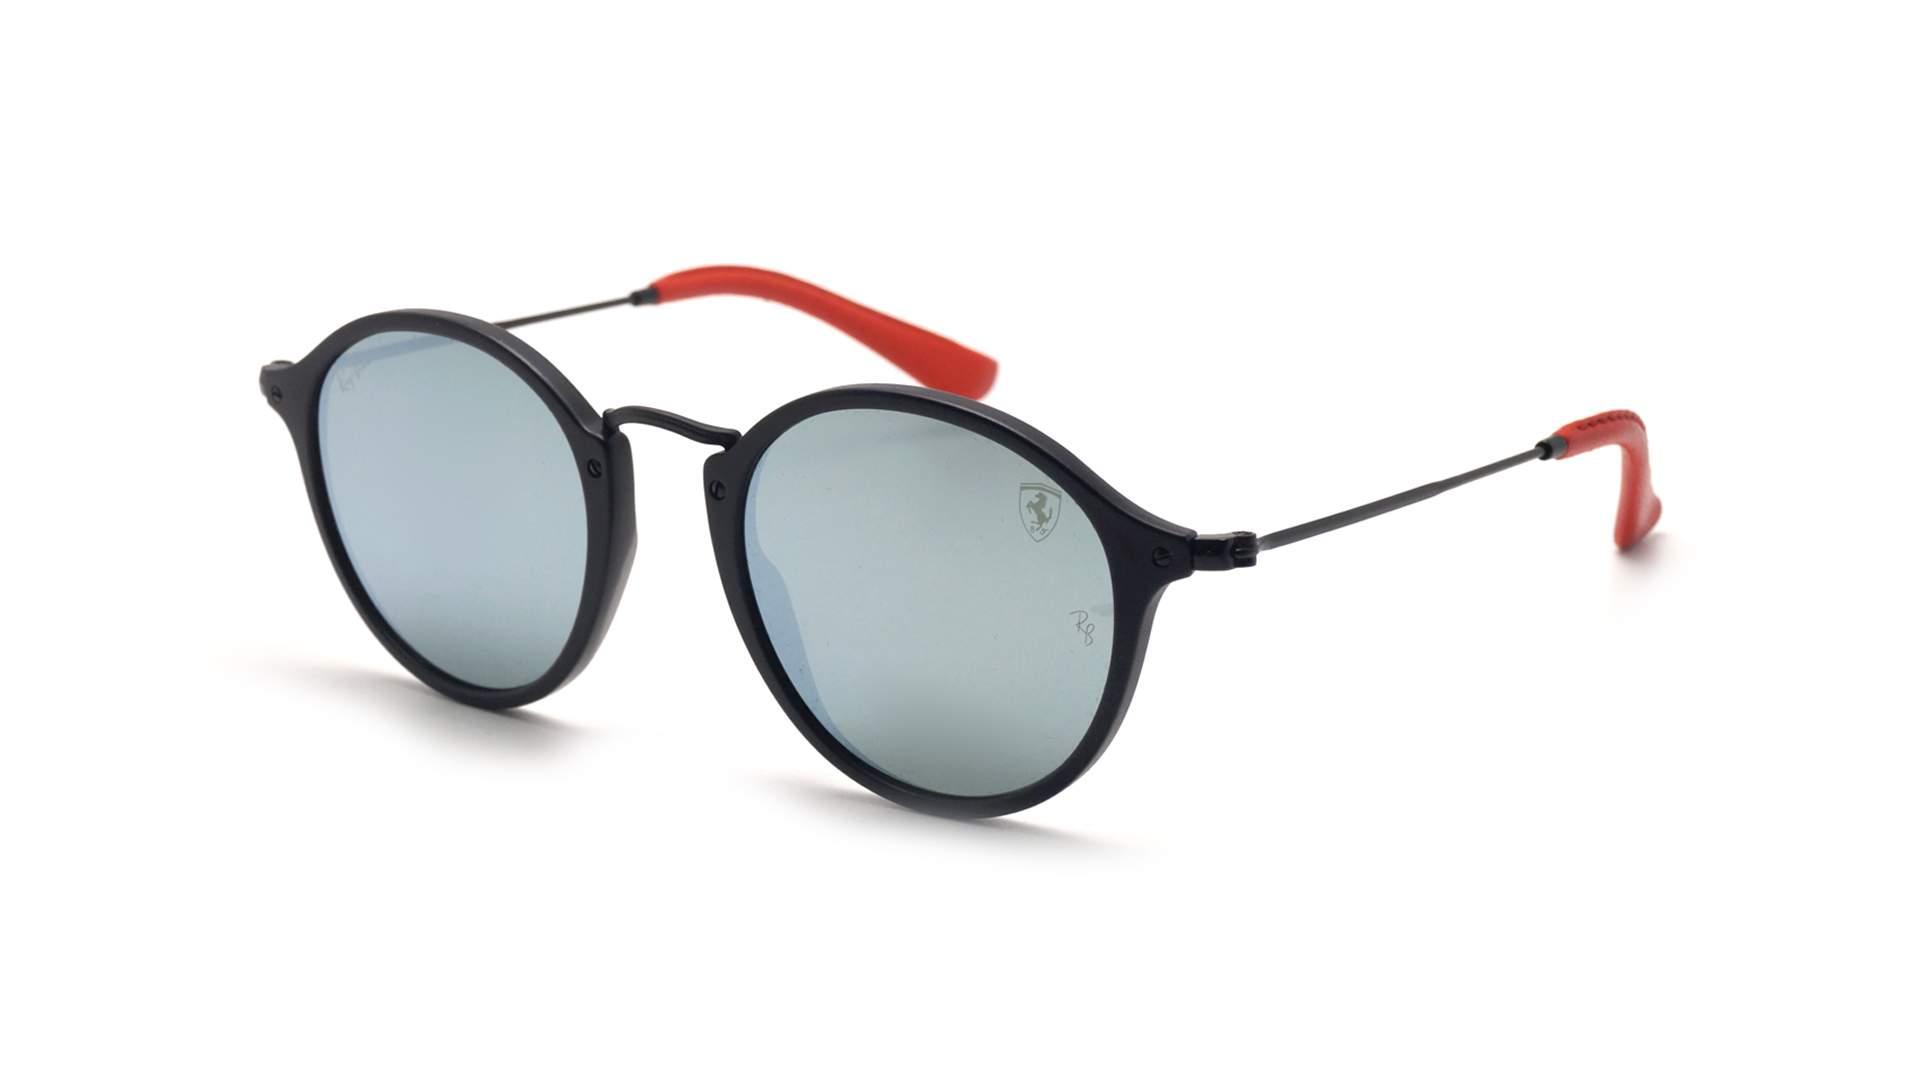 5bf8213674 Sunglasses Ray-Ban Round Scuderia Ferrari Black Matte RB2447NM F602 30  49-21 Medium Mirror